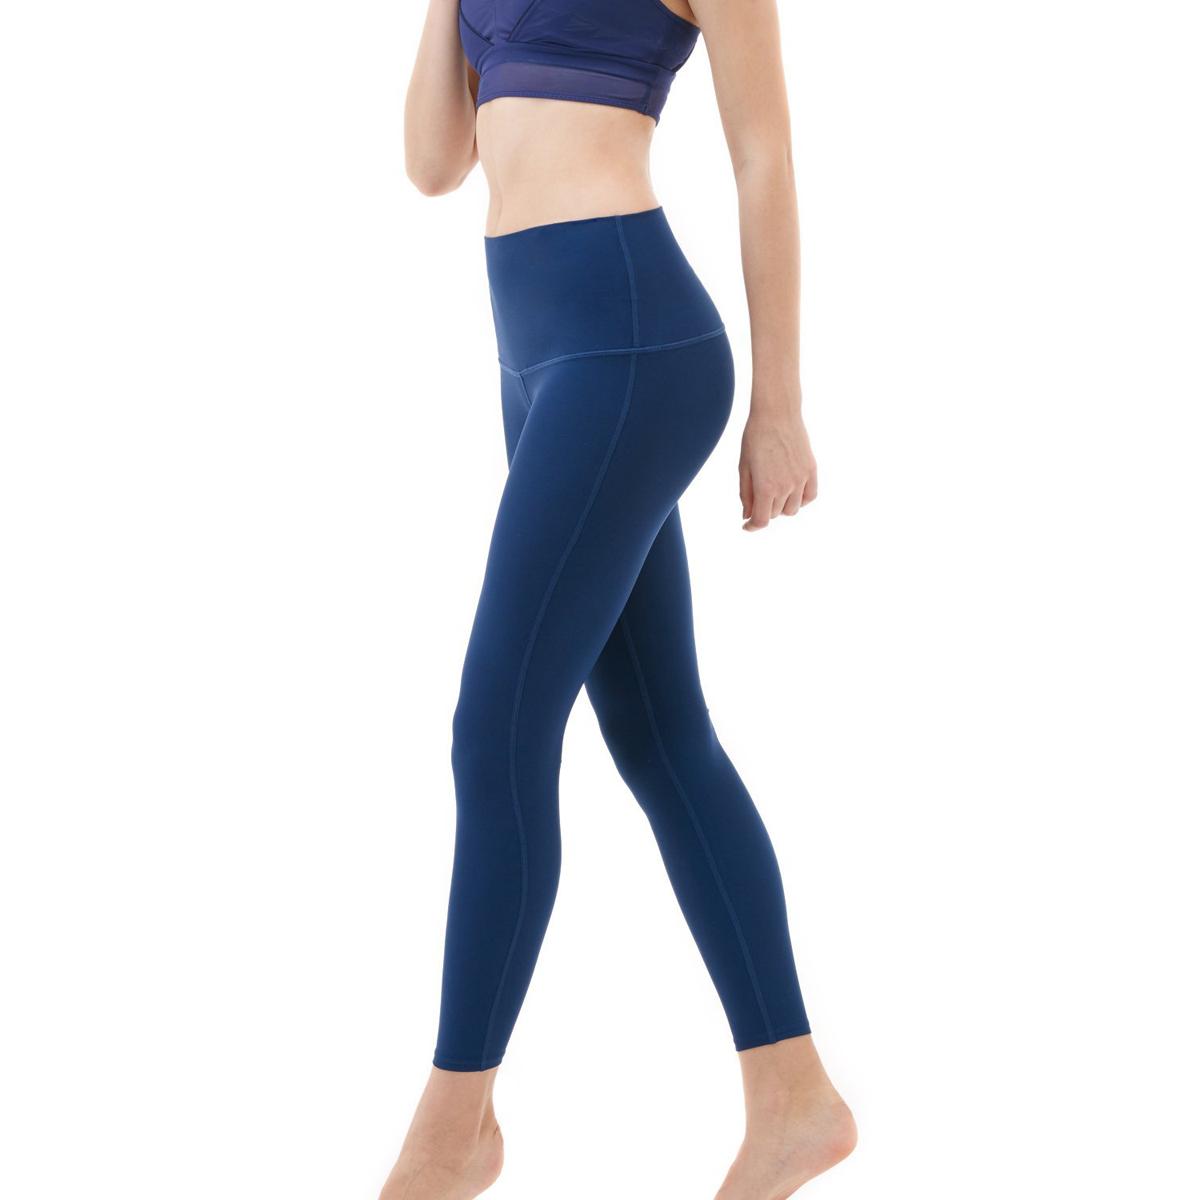 thumbnail 45 - TSLA Tesla FYP42 Women's High-Waisted Ultra-Stretch Tummy Control Yoga Pants